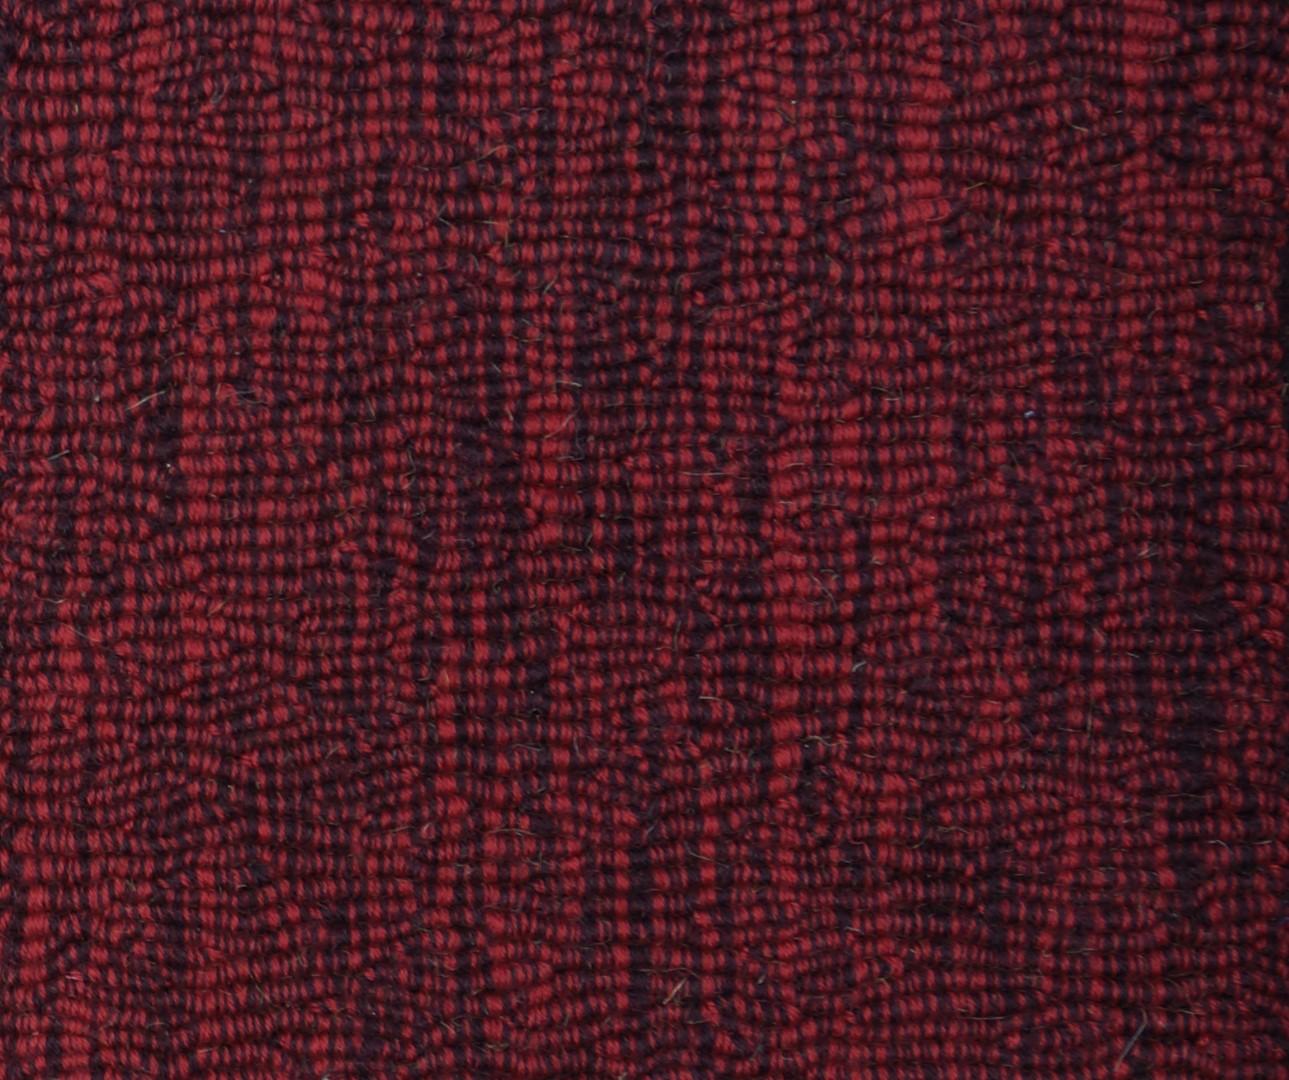 Moquette tiss e 100 laine unie structur e ray e astrakan prune rouge collection textile for Moquette rayee